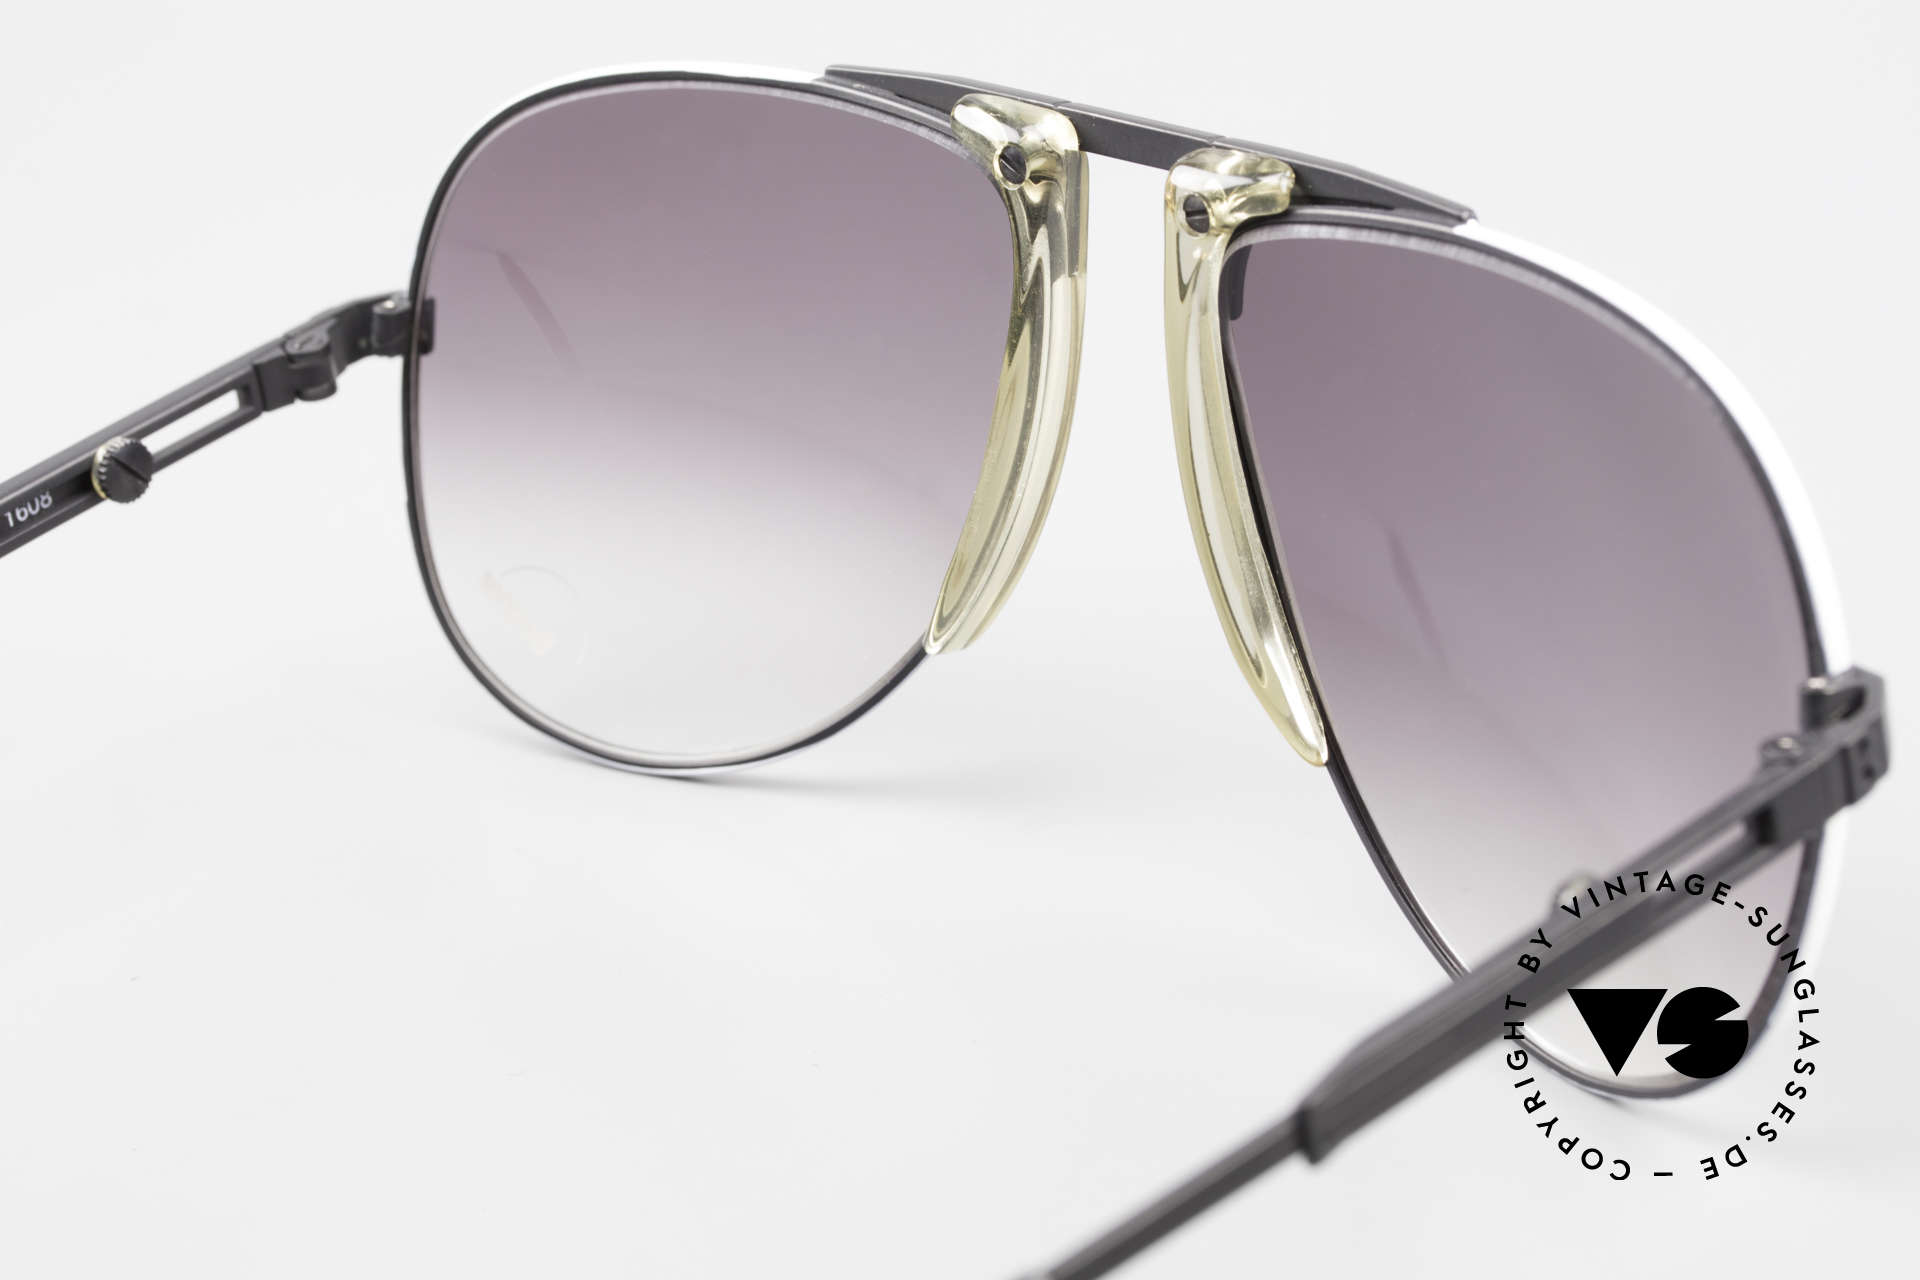 Willy Bogner 7011 Men 80's Sunglasses Adjustable, NO RETRO SHADES, but a rare old 1980's ORIGINAL!, Made for Men